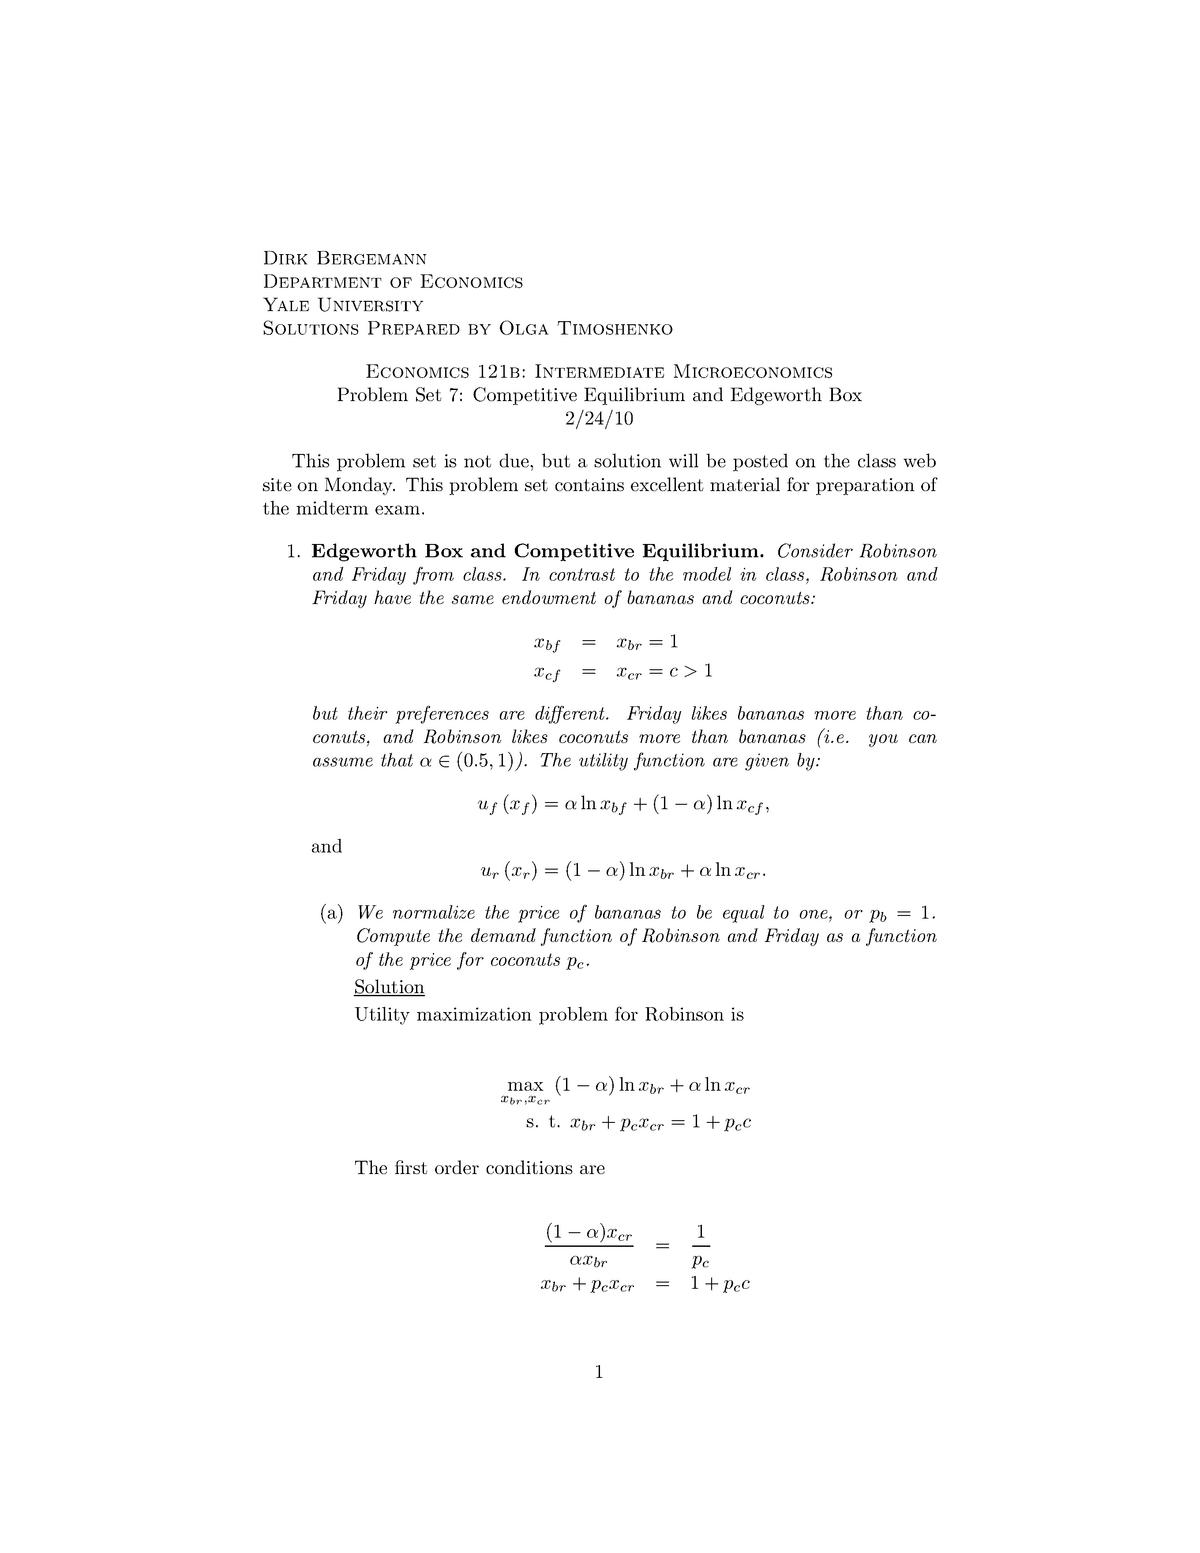 Seminar assignments - Problem set 7: competitive equilibrium